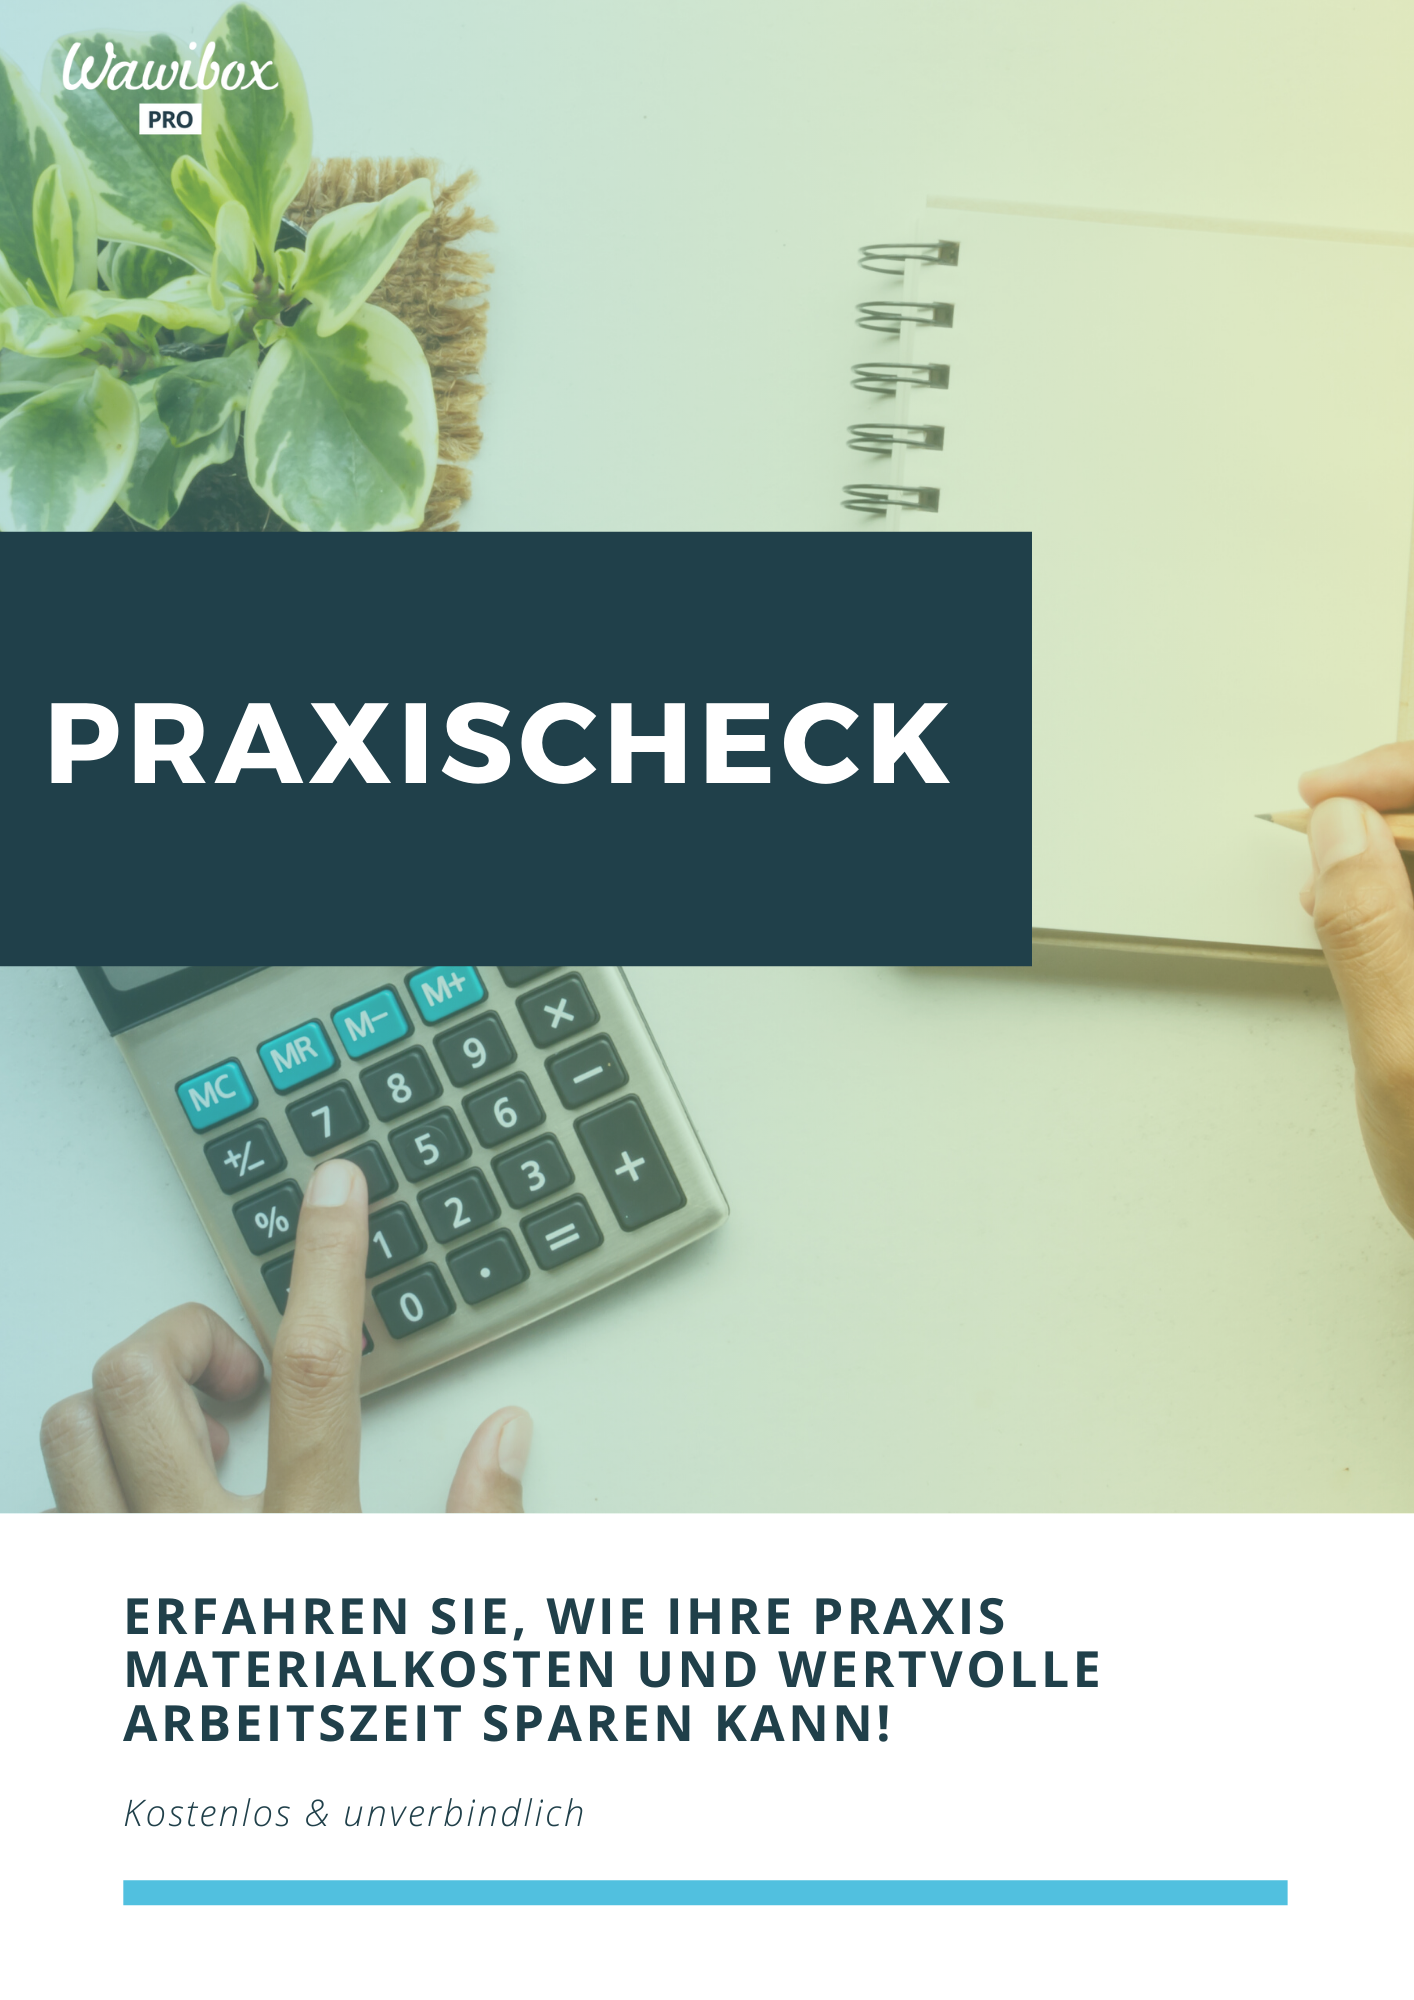 Wawibox Pro_Musterdokument_Praxischeck